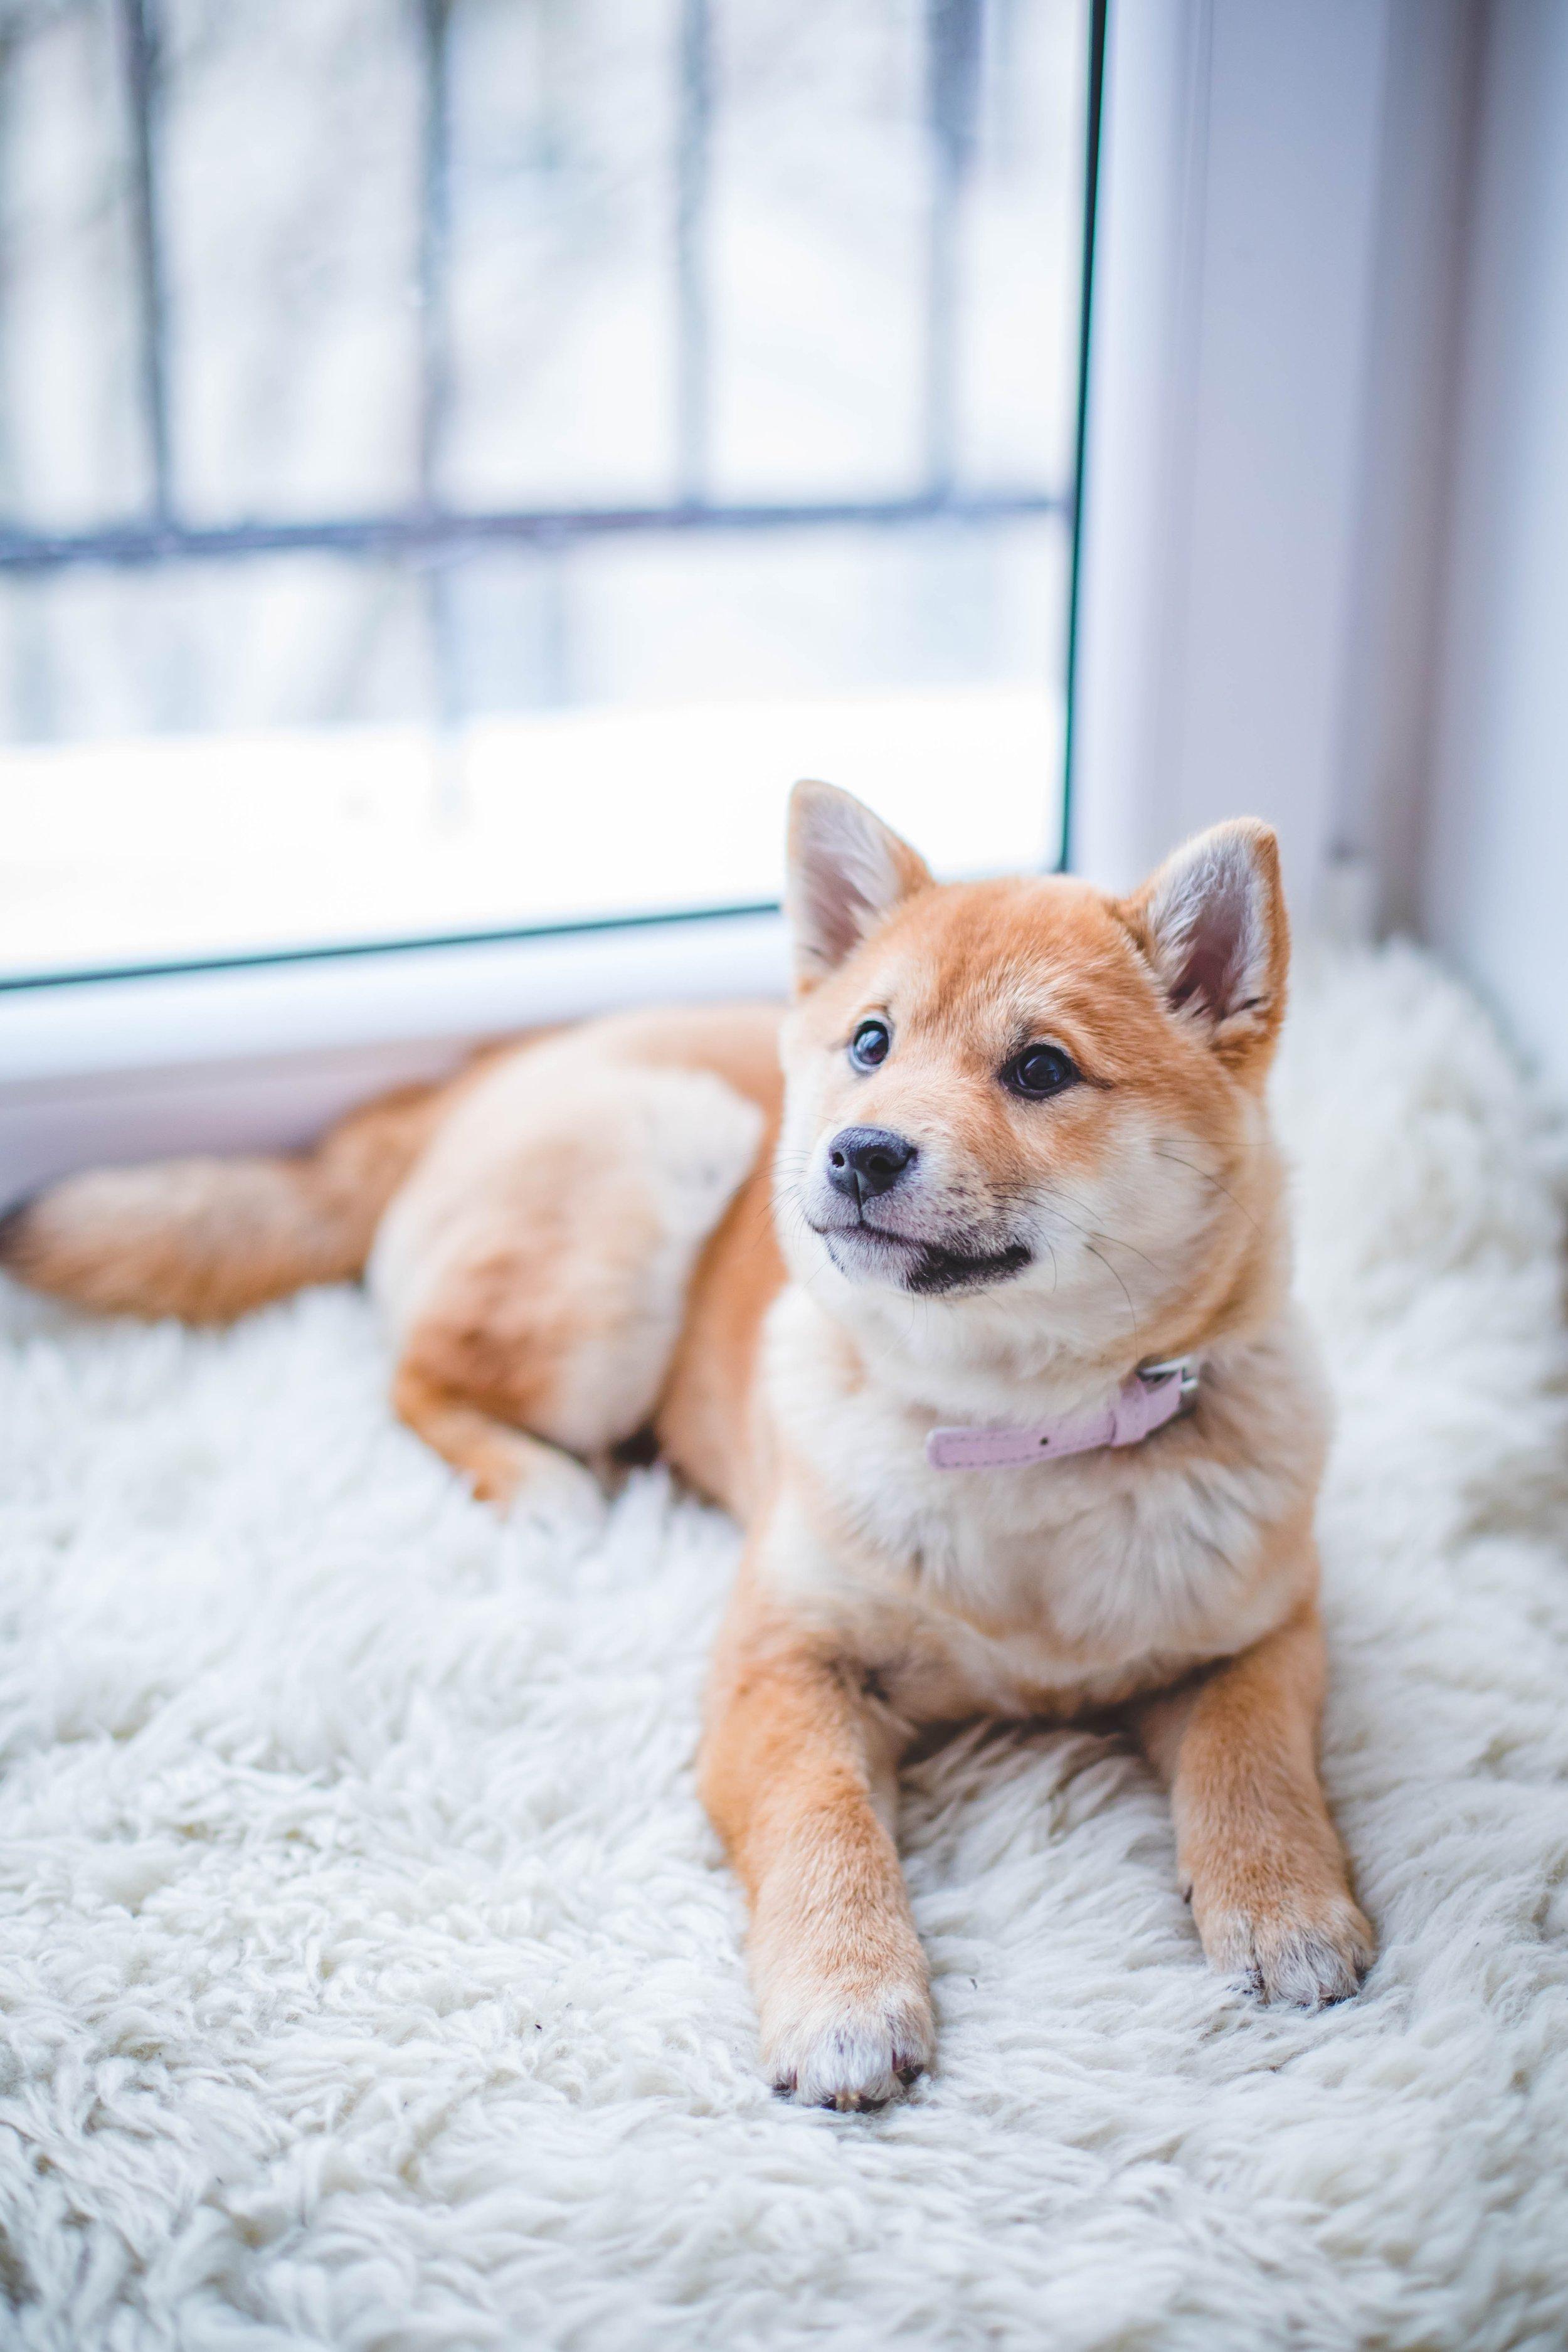 Dog on Carpet.jpg